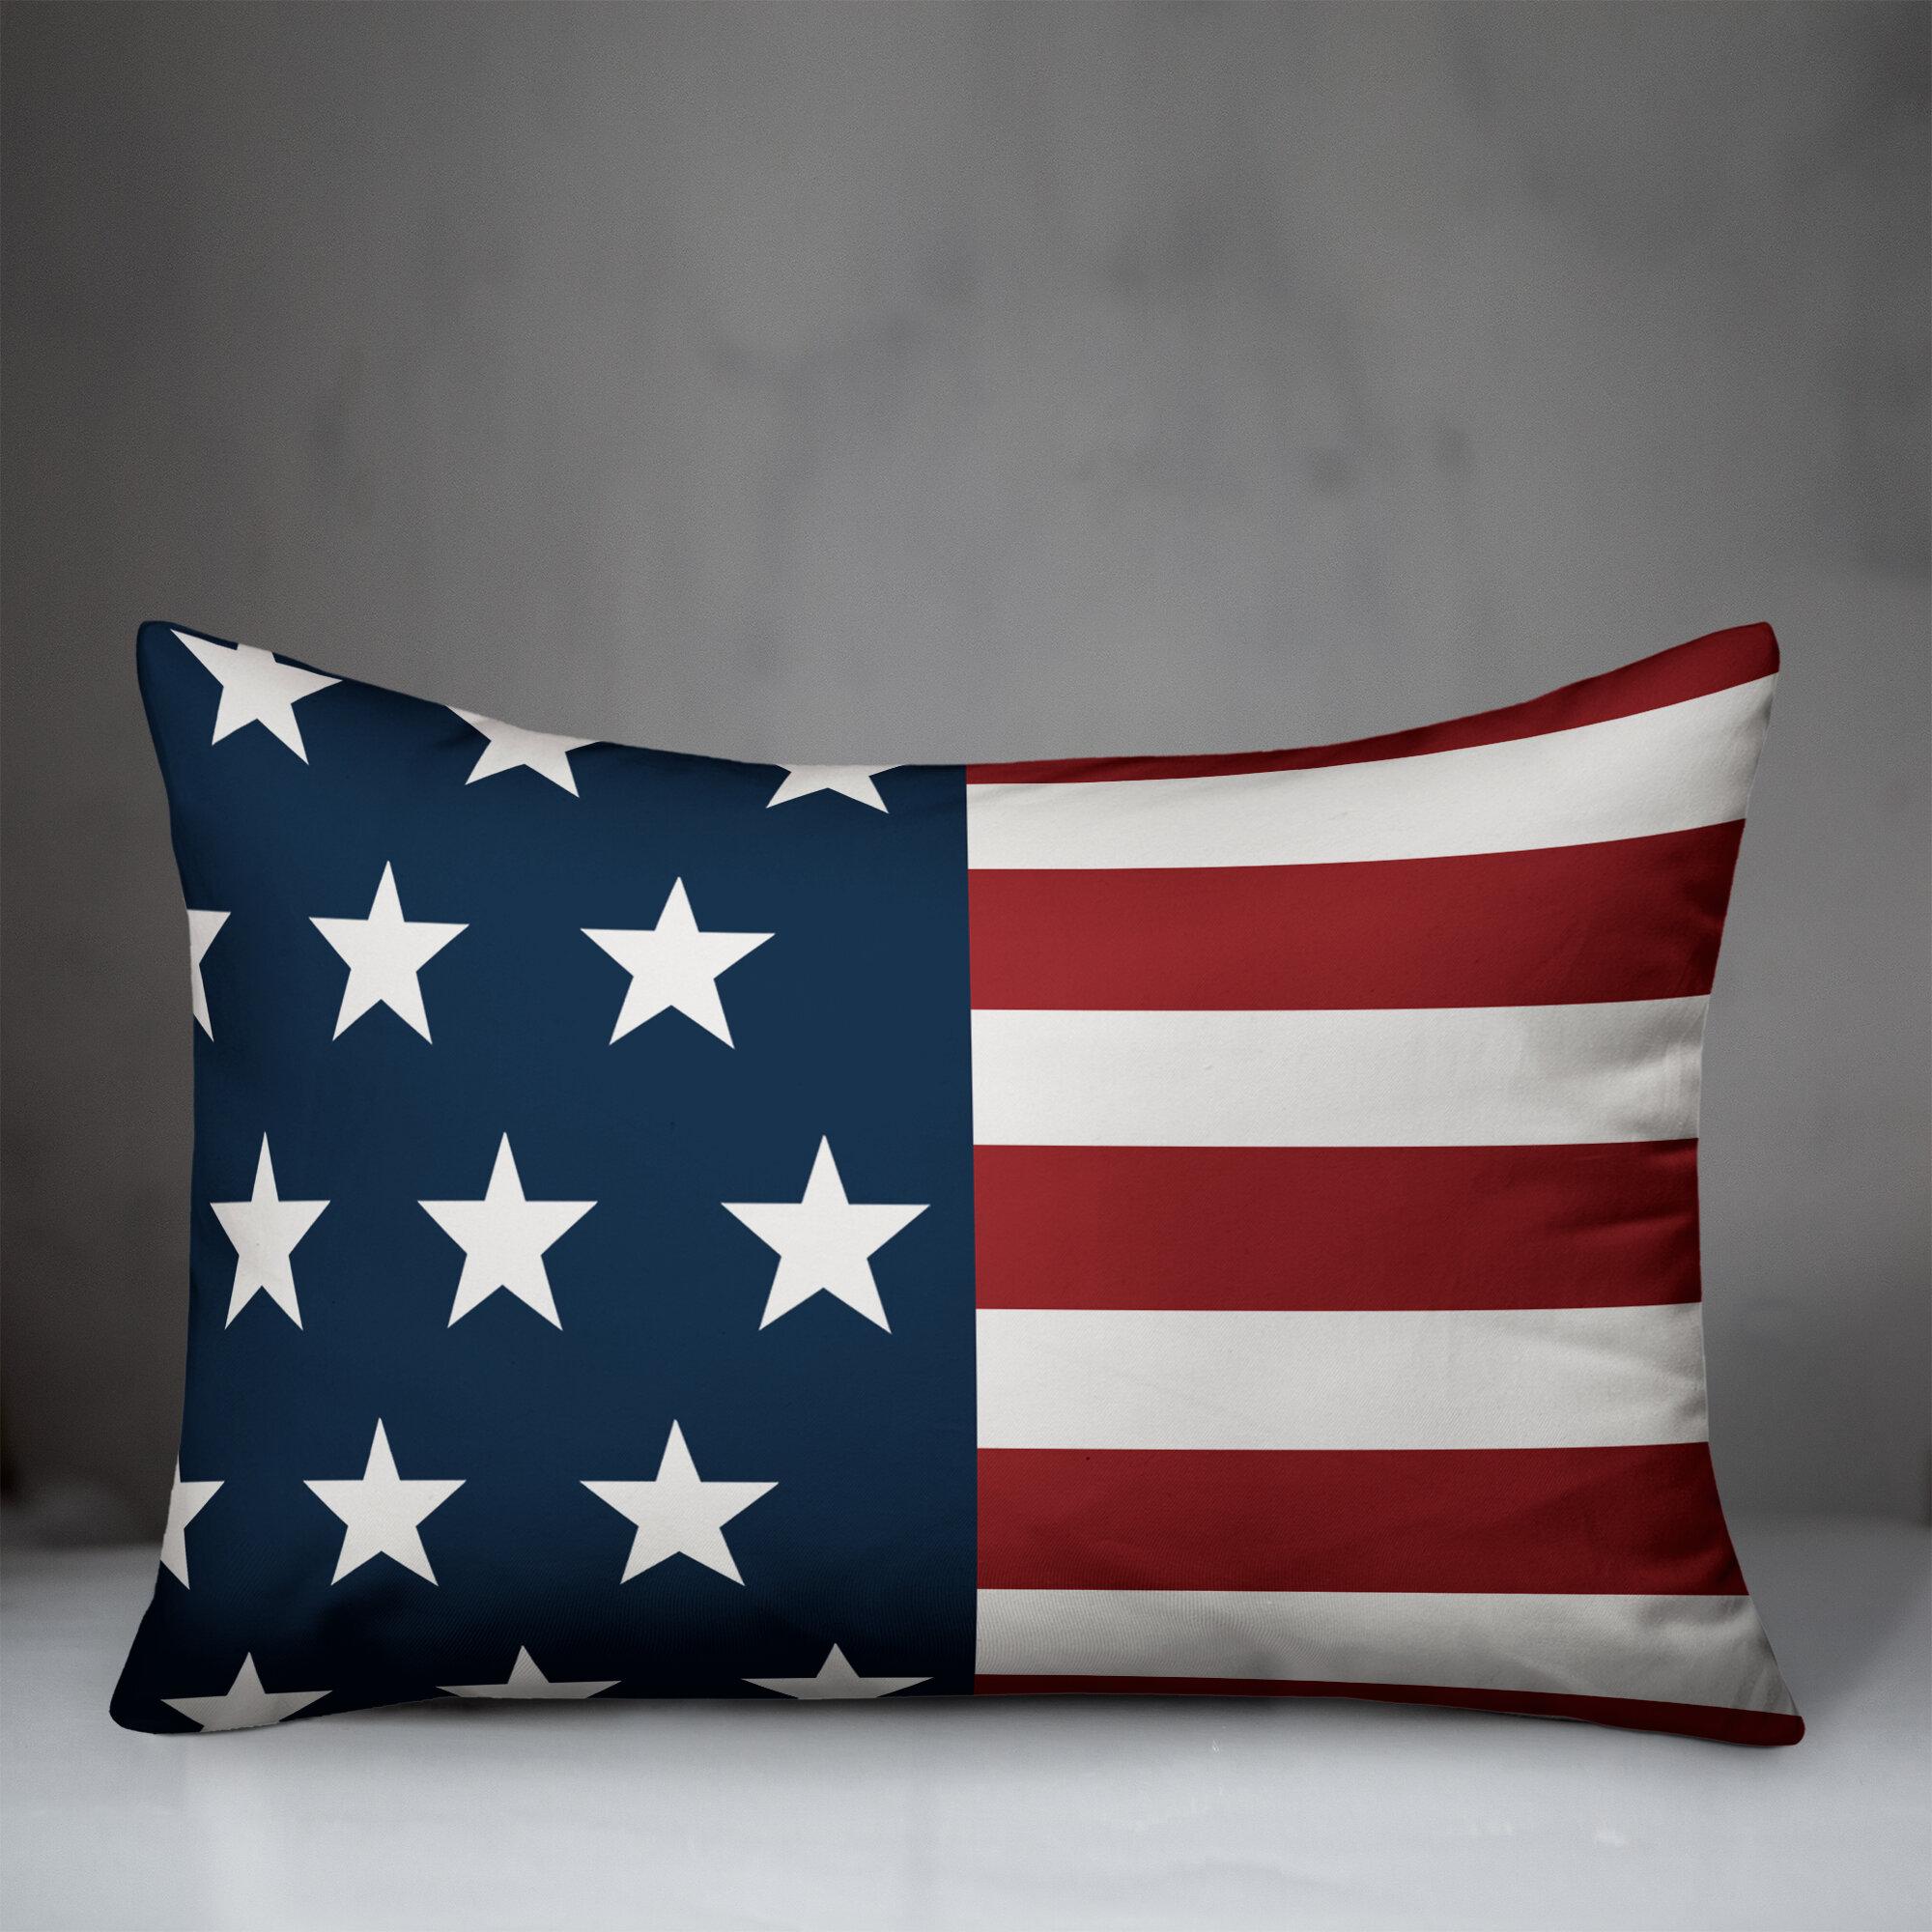 August Grove Willernie American Flag Indoor Outdoor Lumbar Pillow Cover Reviews Wayfair